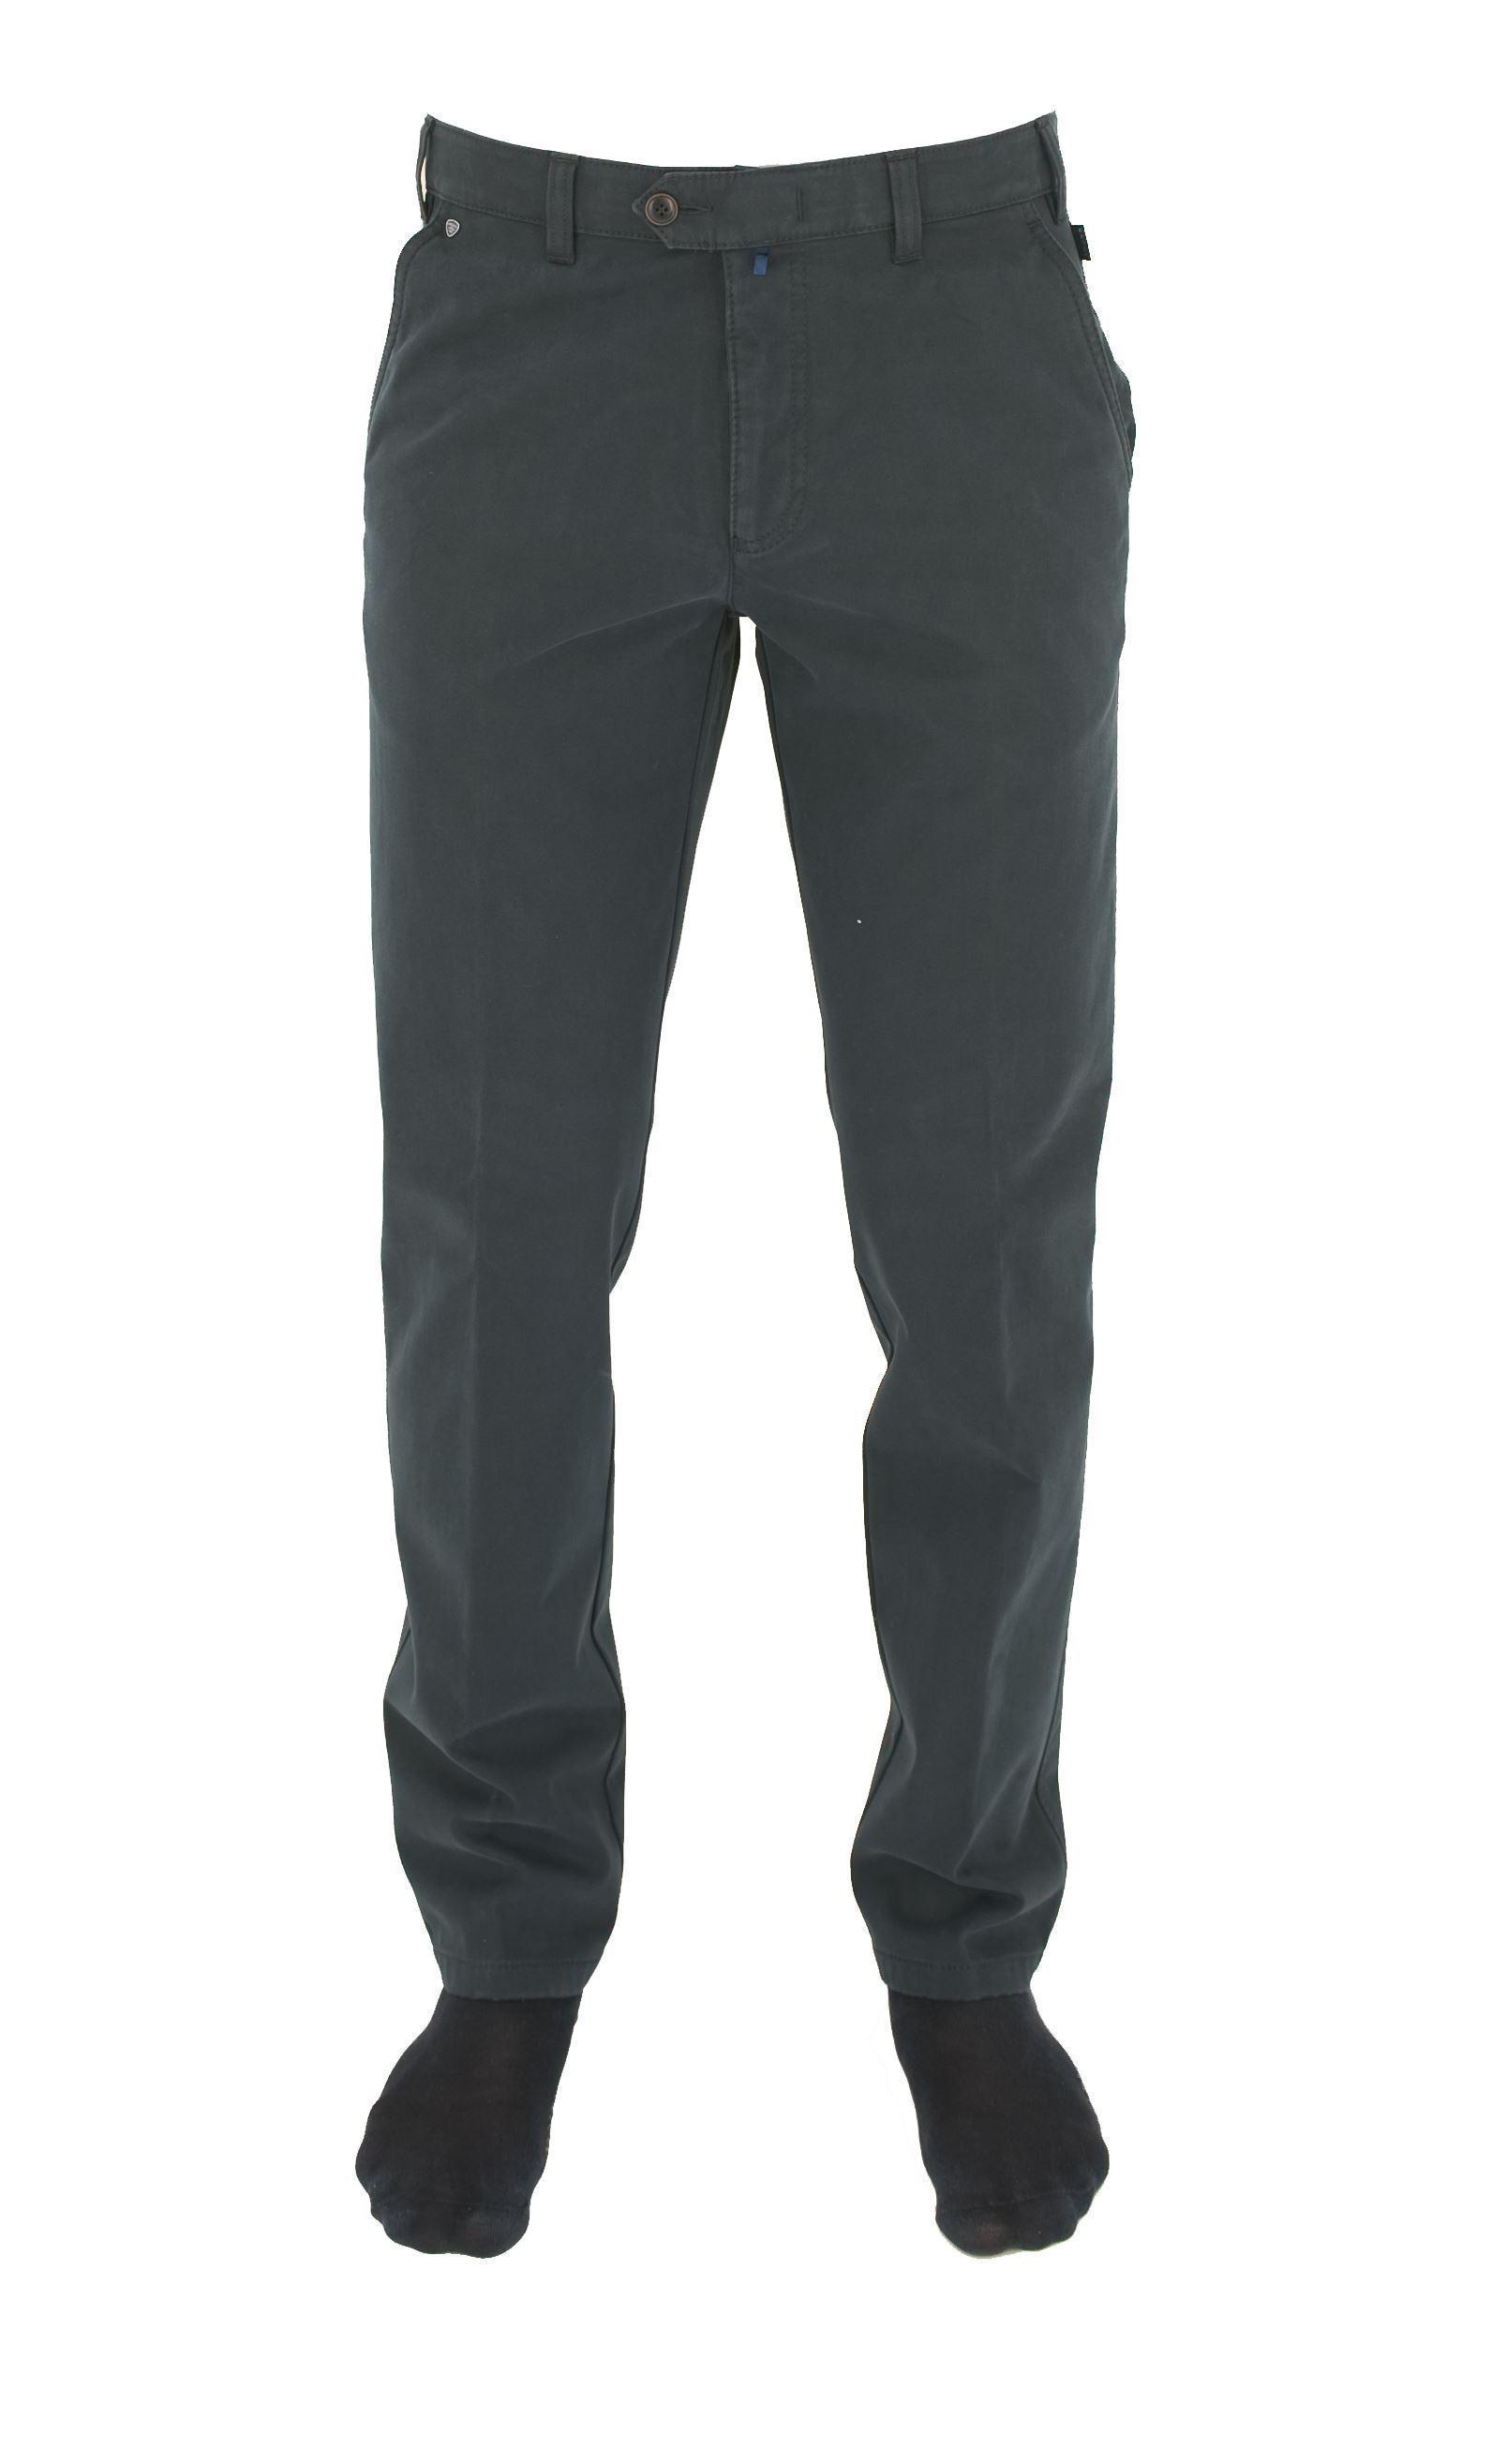 Immagine di Pantalone termico